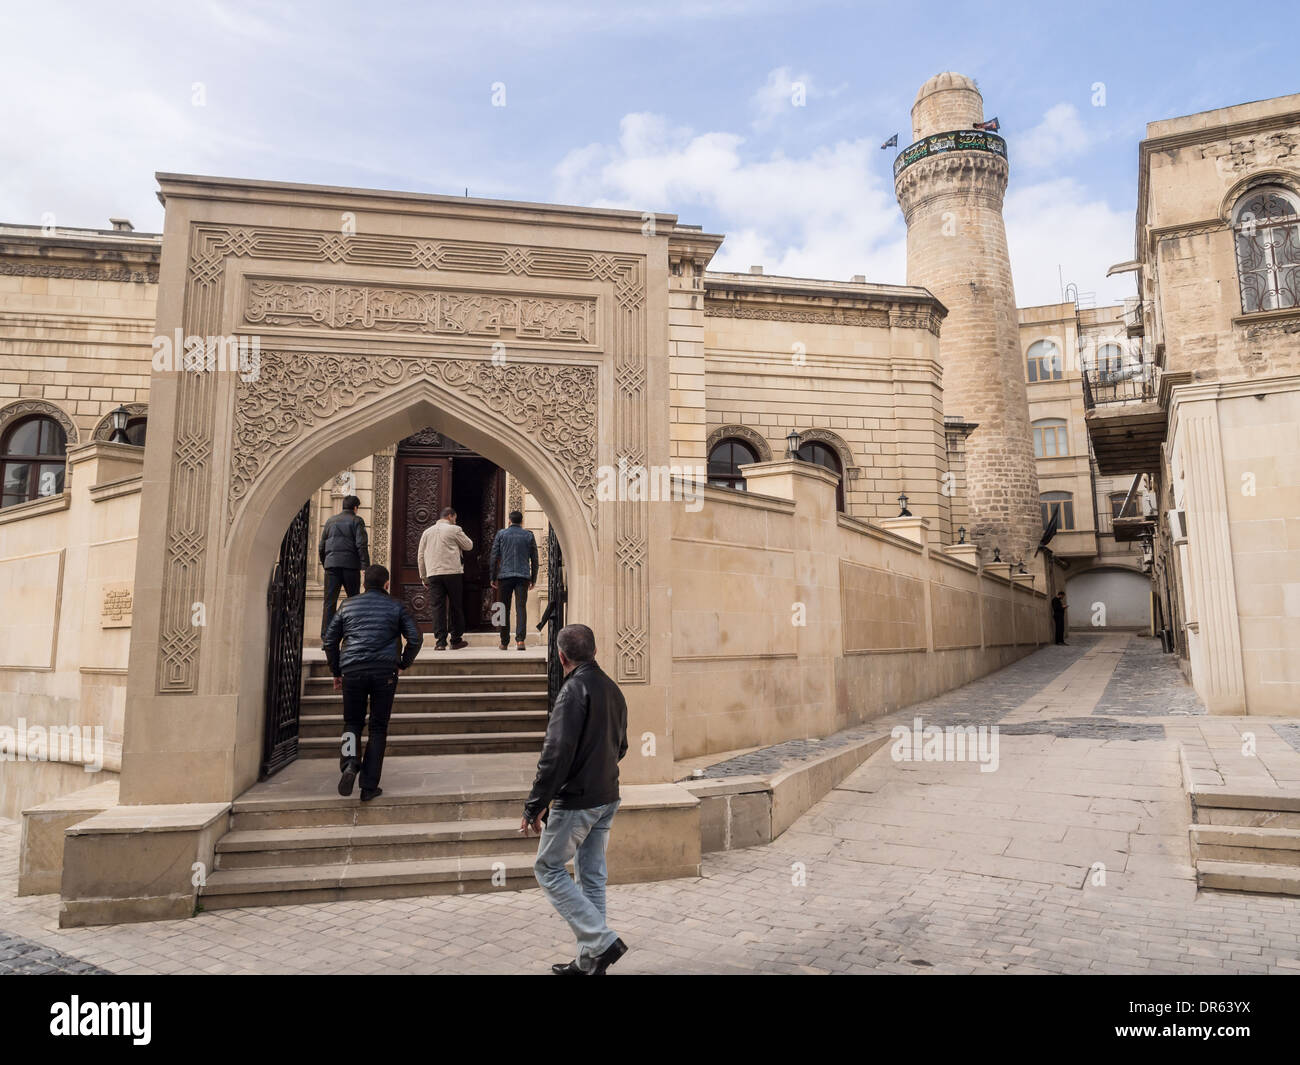 Icheri Sheher (Old Town) of Baku, Azerbaijan. - Stock Image